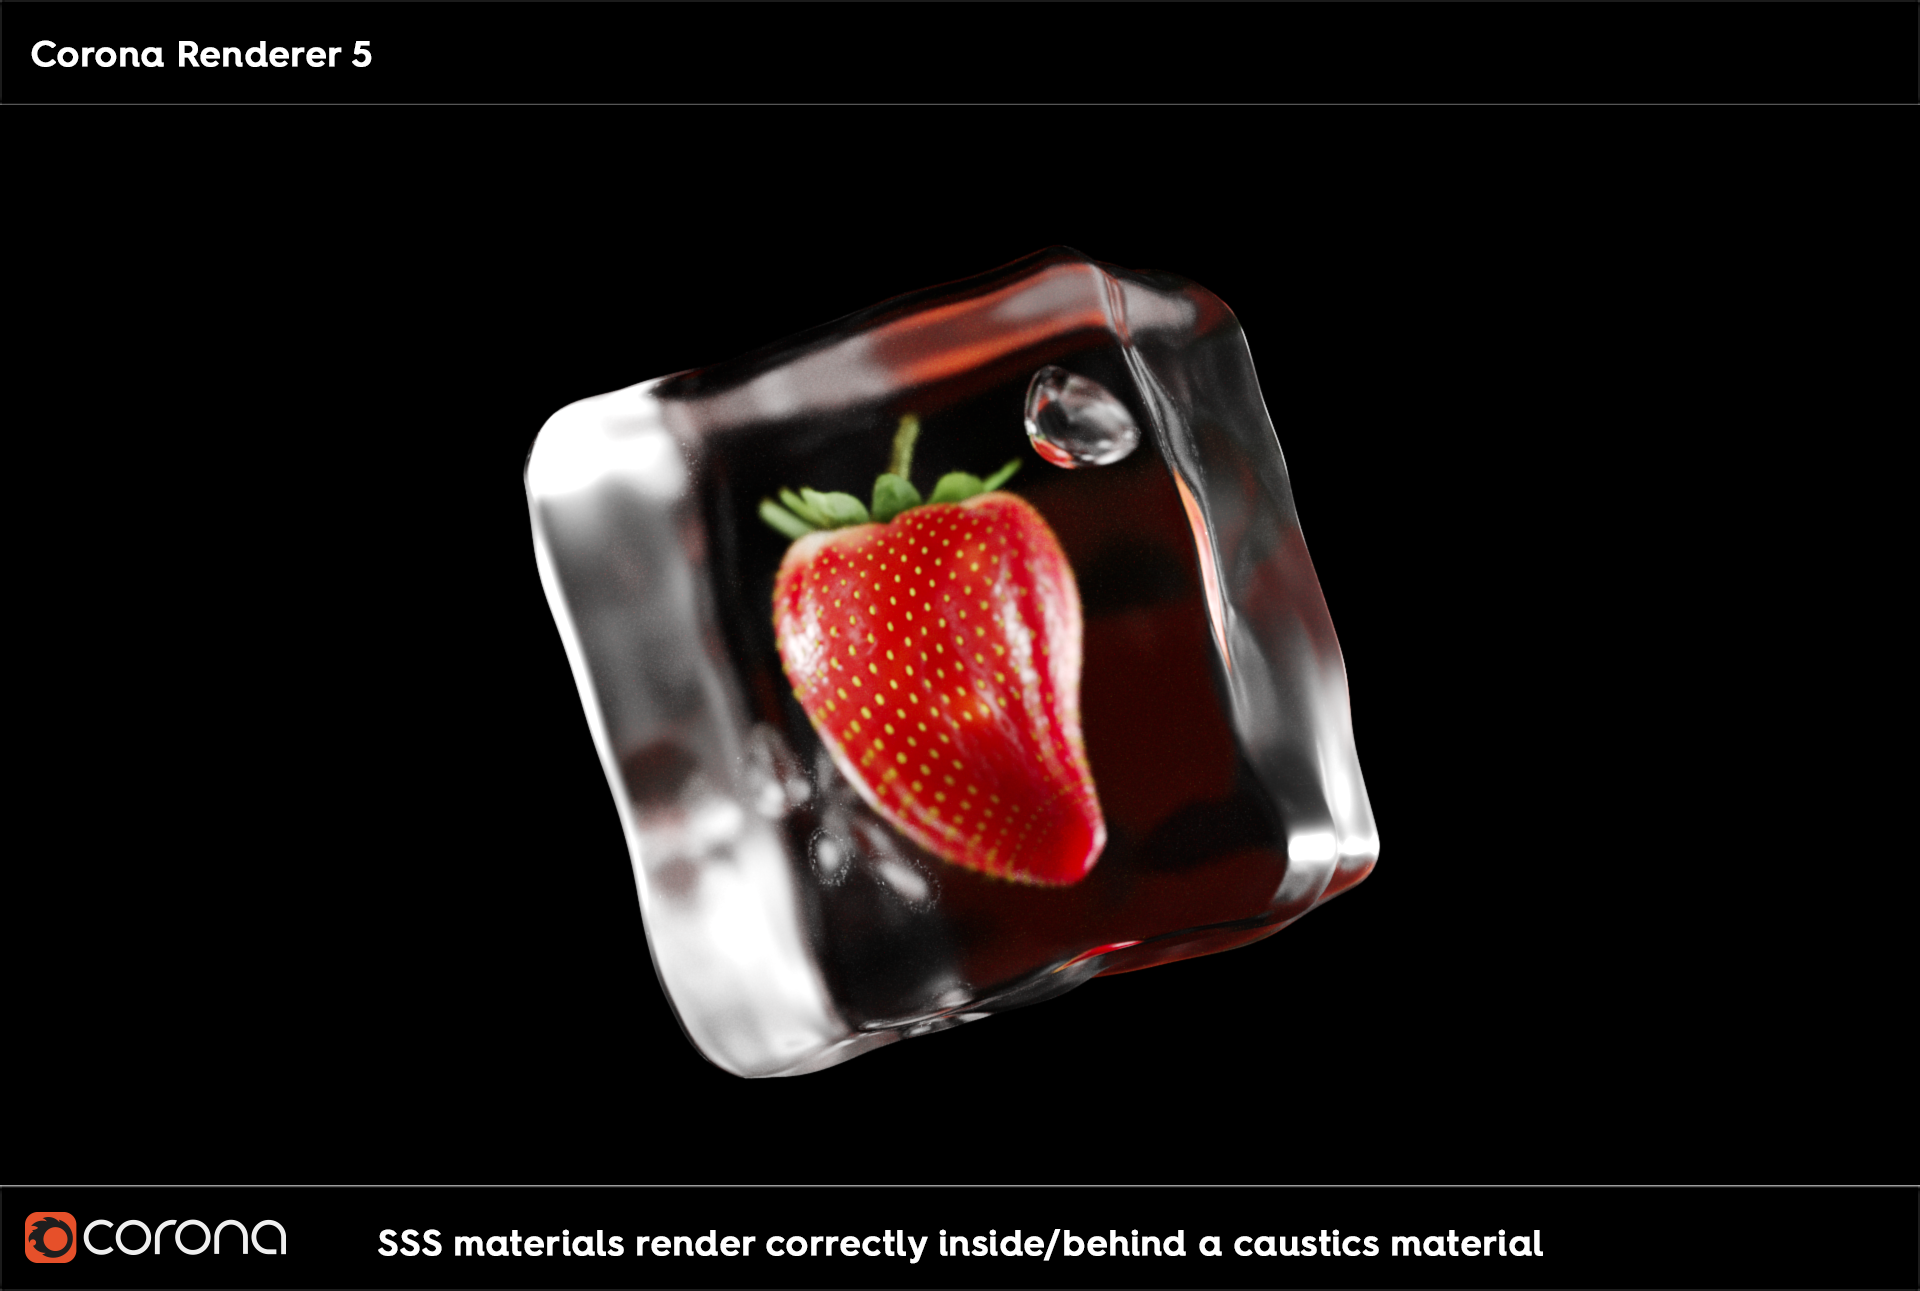 Corona render SSS materials